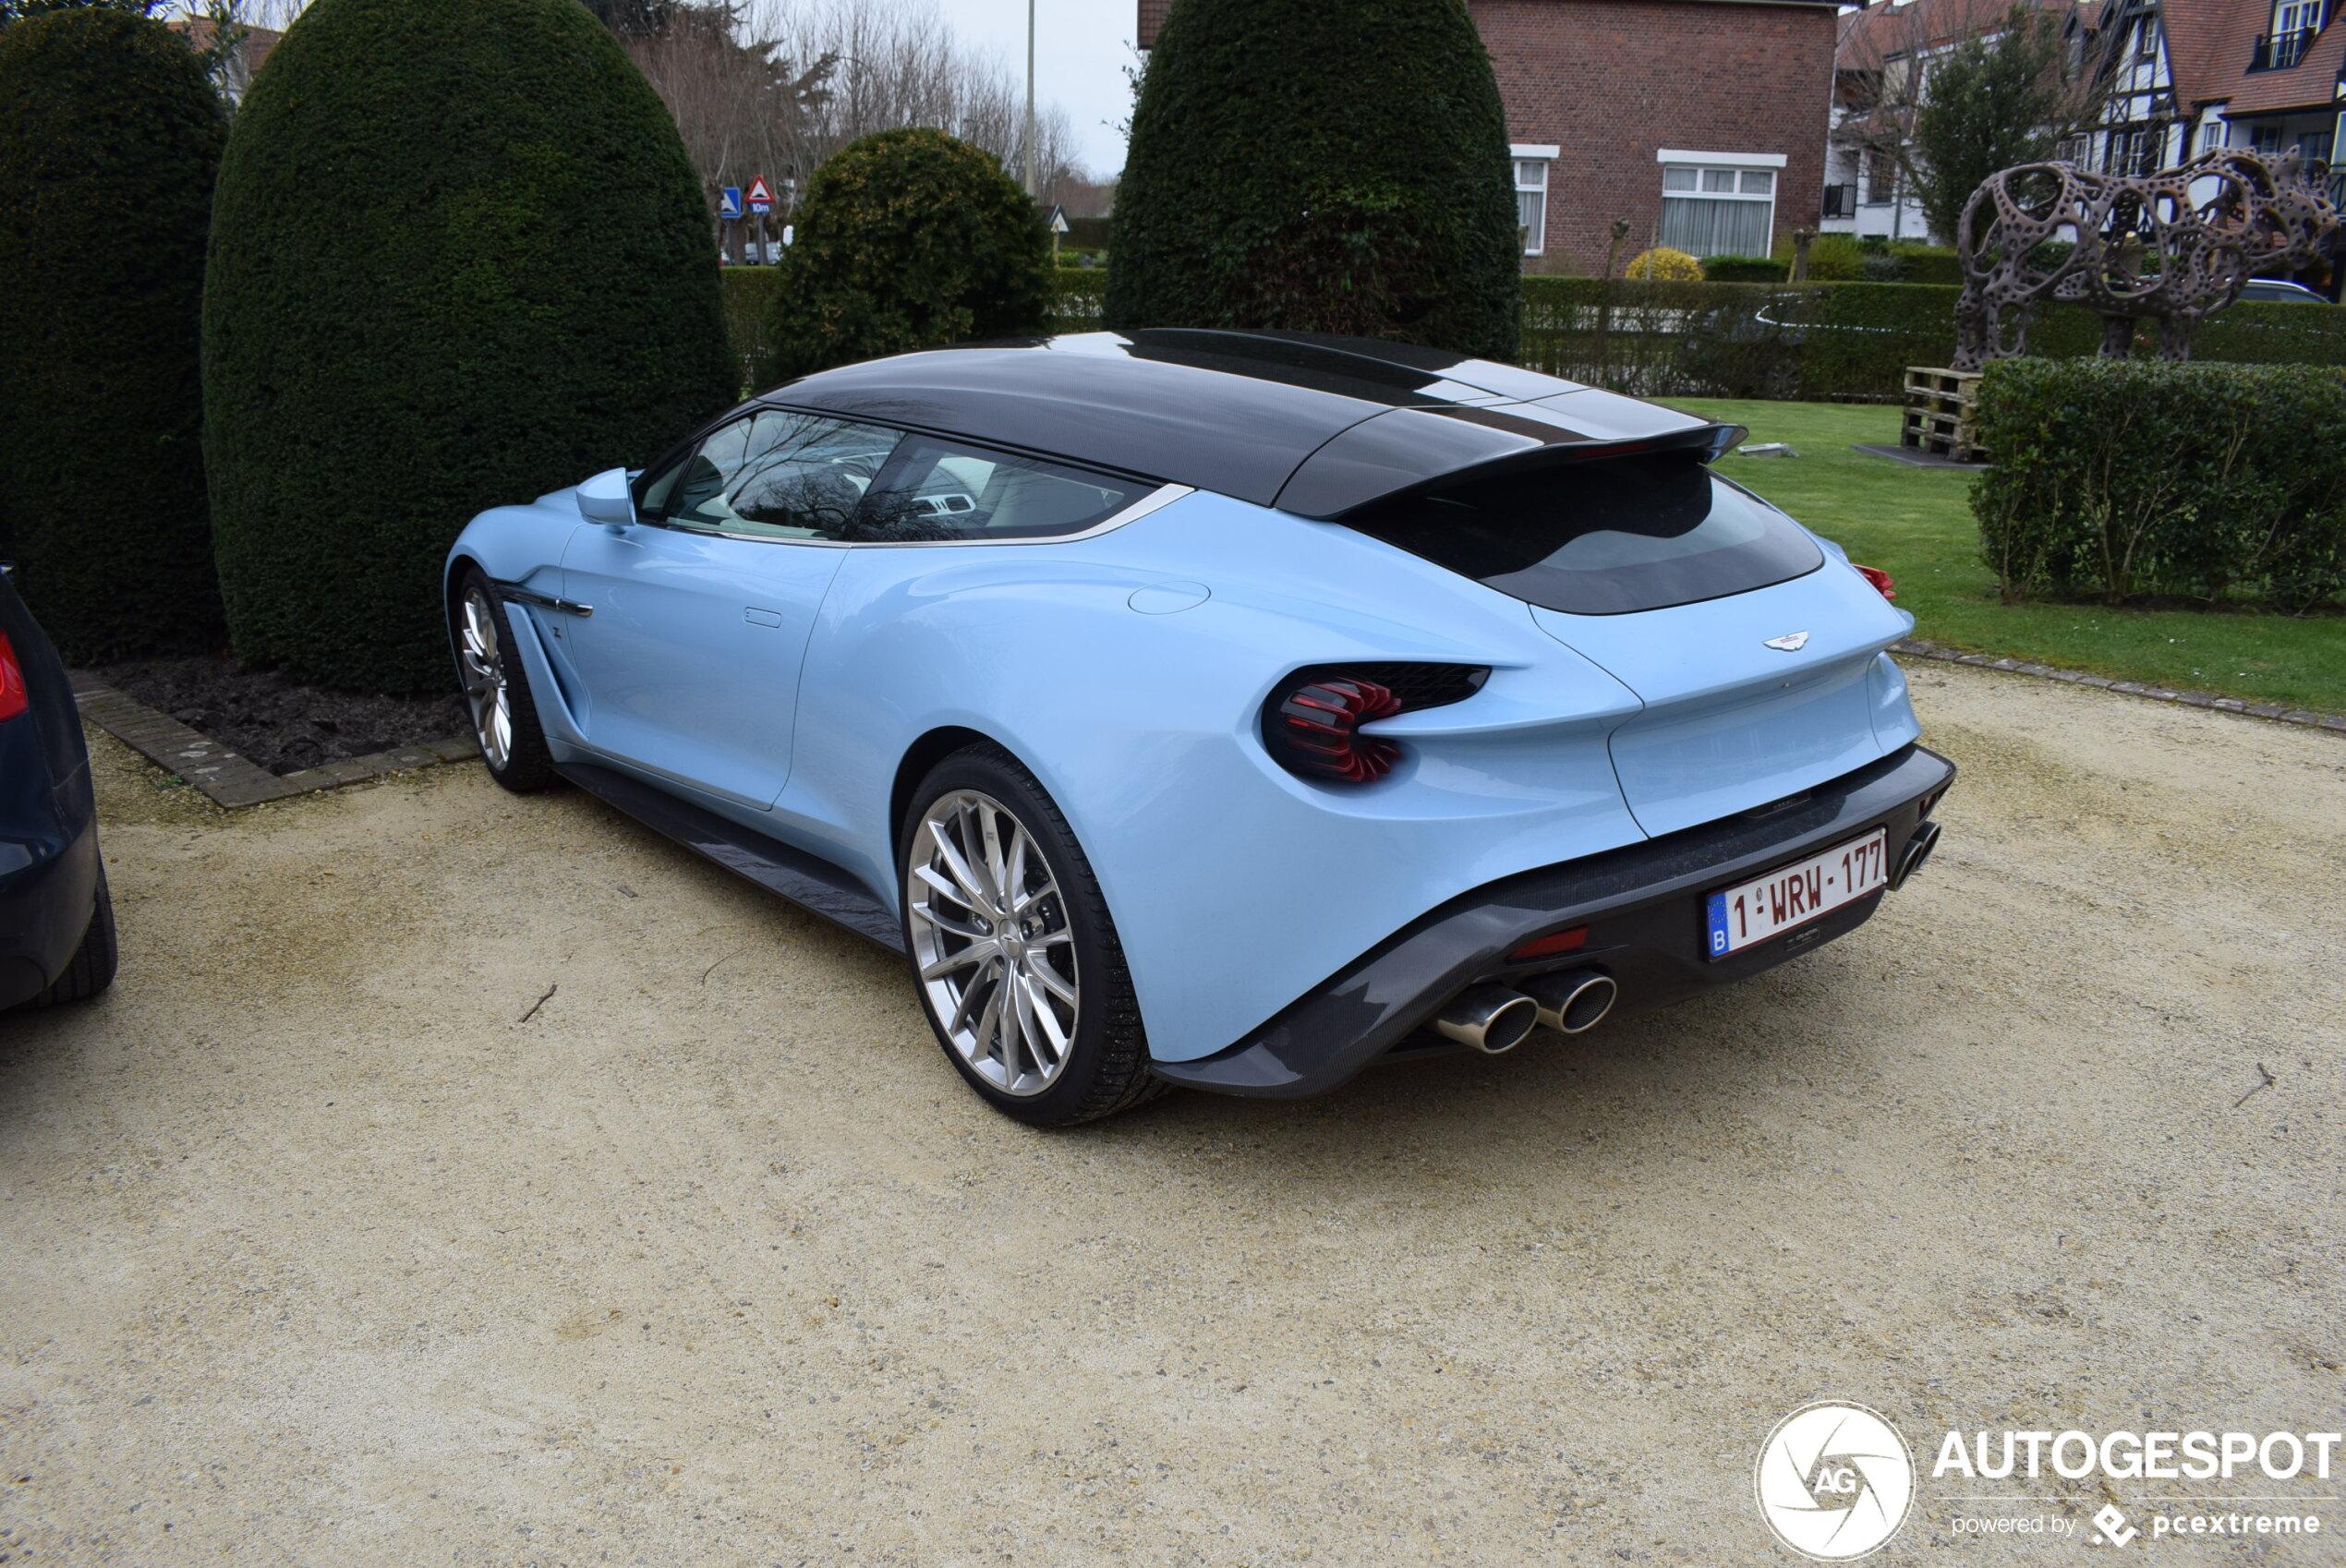 Aston Martin Vanquish Zagato Shooting Brake 7 Marzo 2020 Autogespot